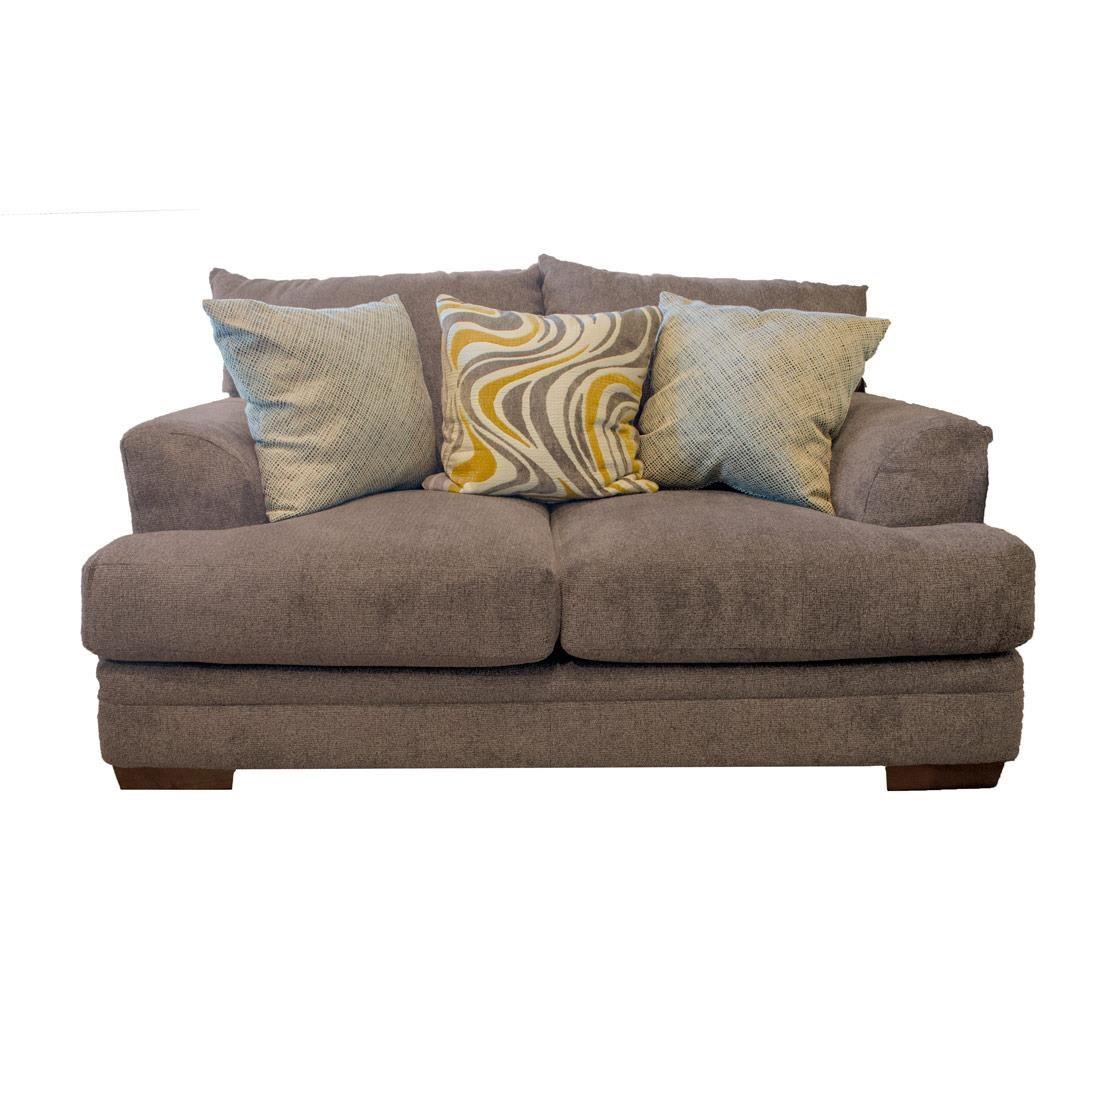 Jackson Furniture Crompton Pewter Loveseat - Item Number: JACK-4462-02 2000-88 2860-27